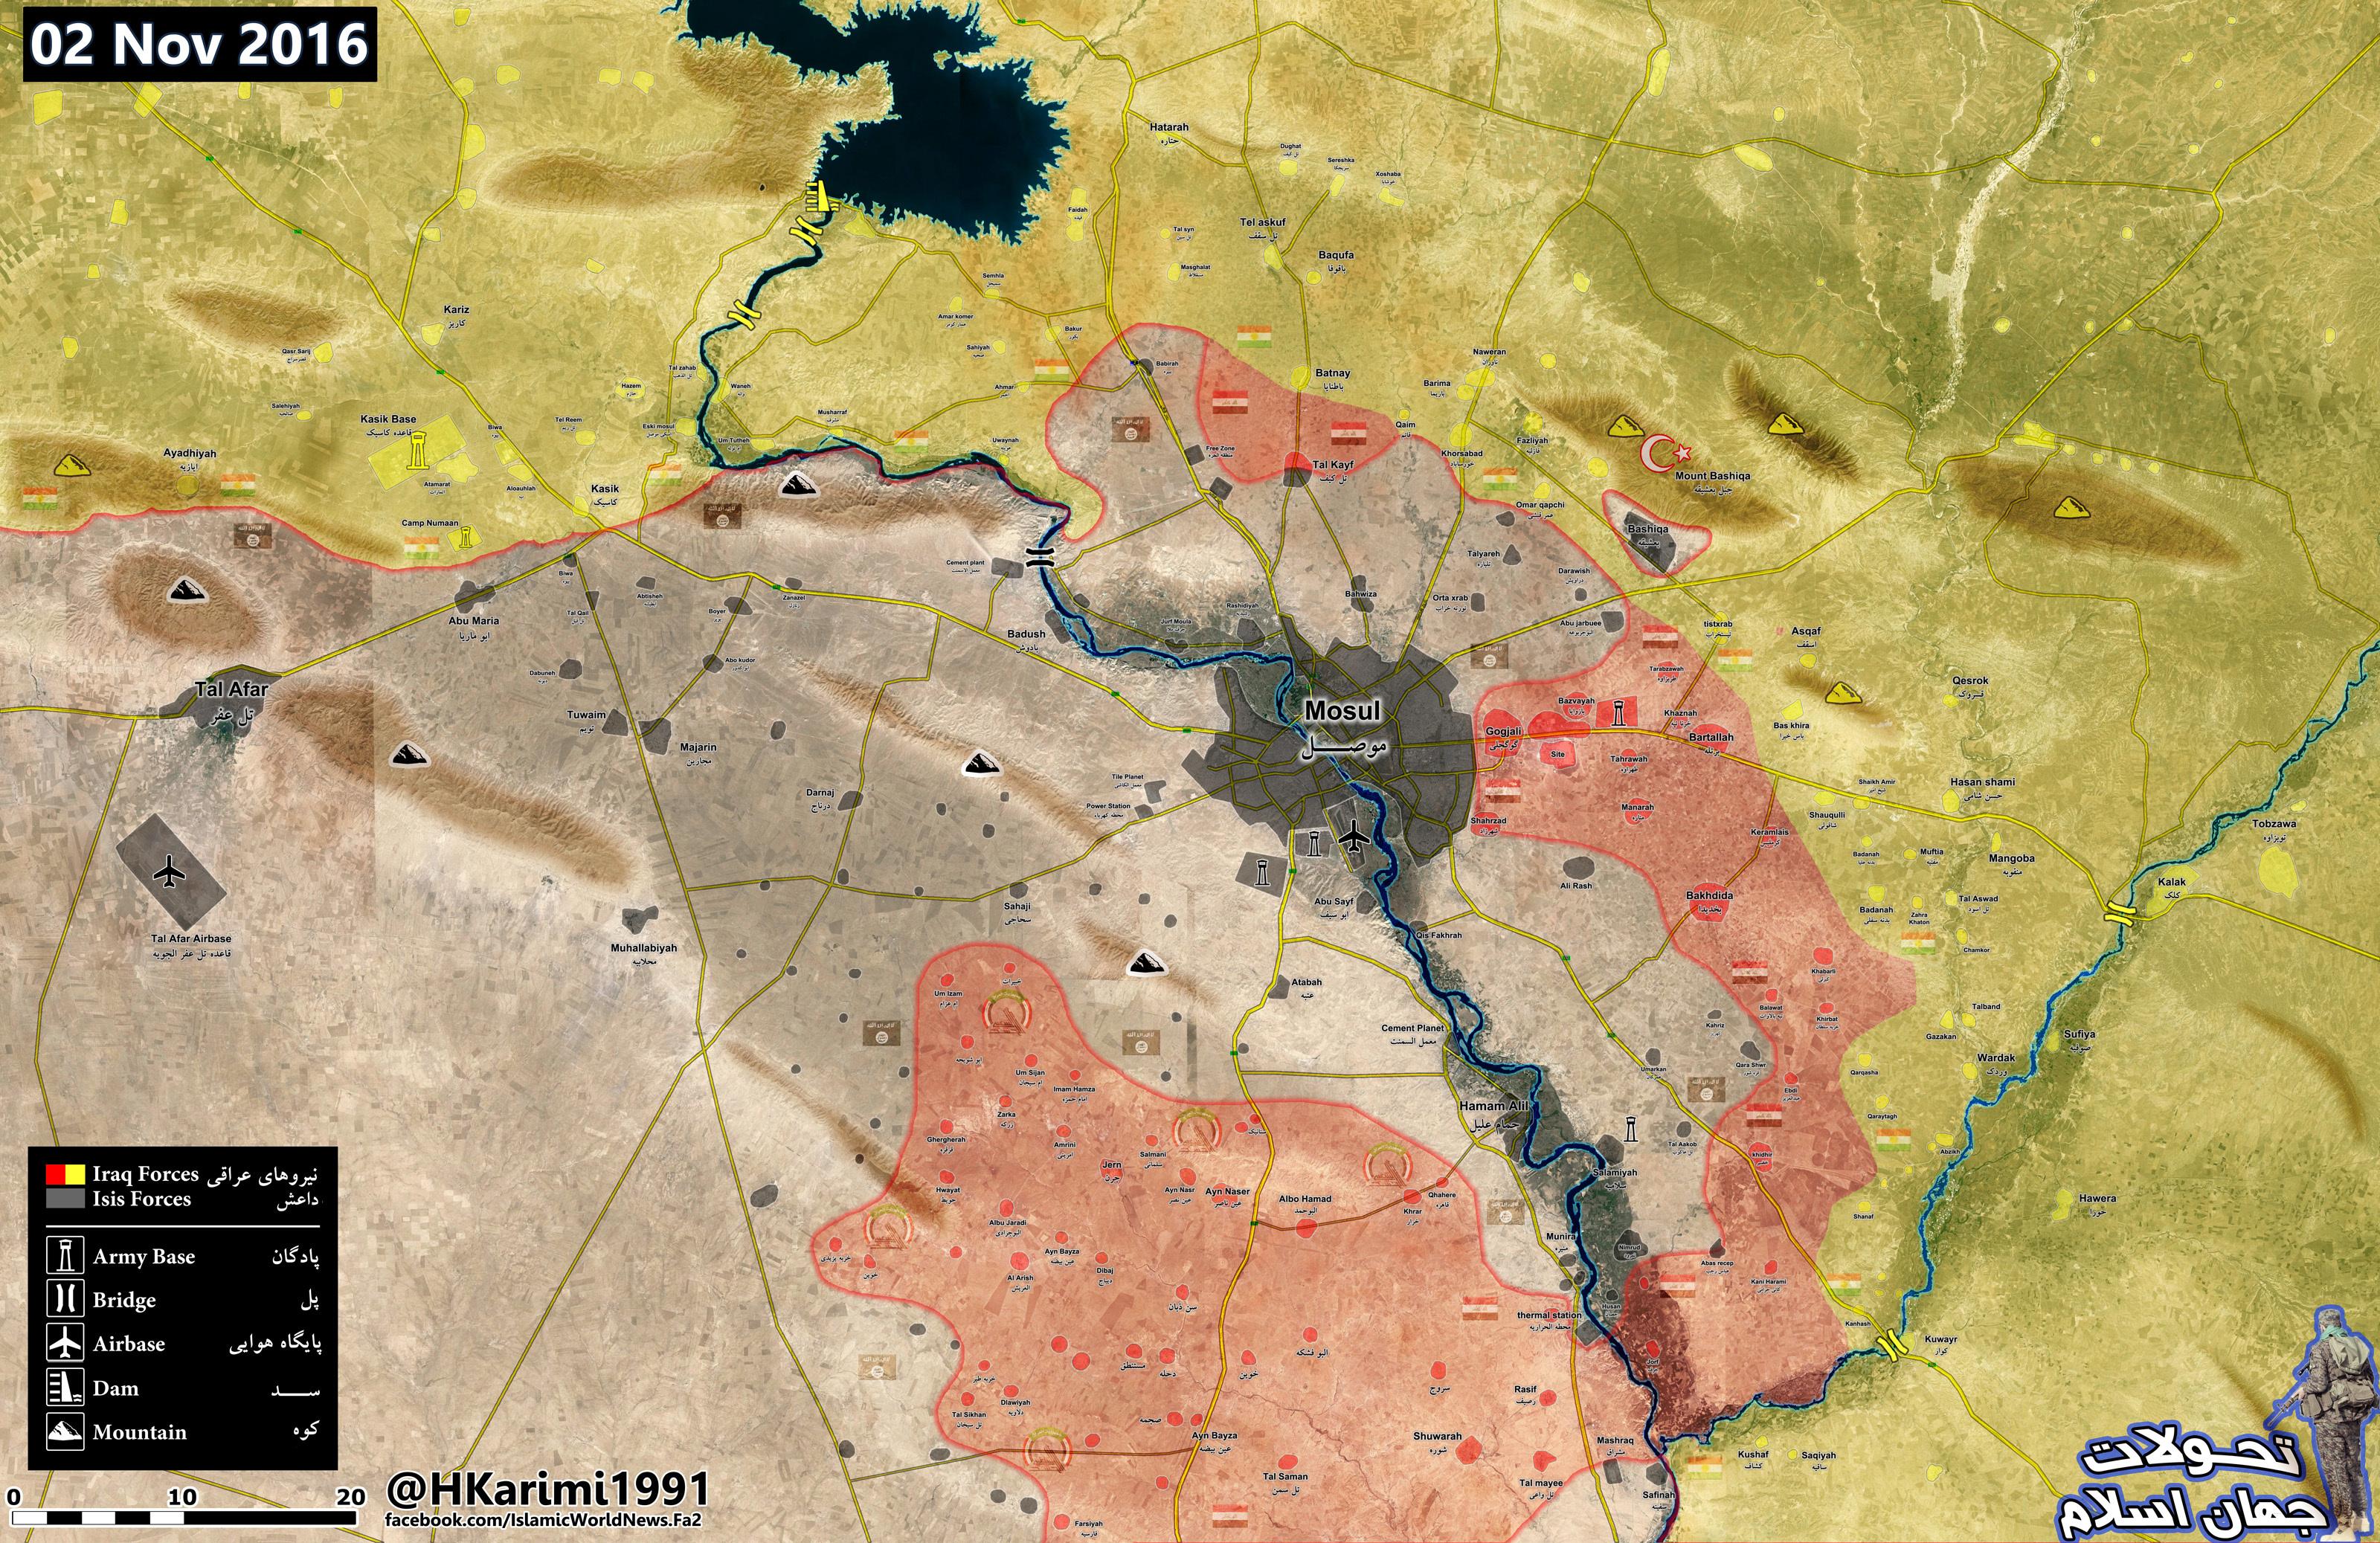 Iraqi Map Update: Iraqi Military and Popular Mobilization Units Shape Battleground in Mosul Countryside